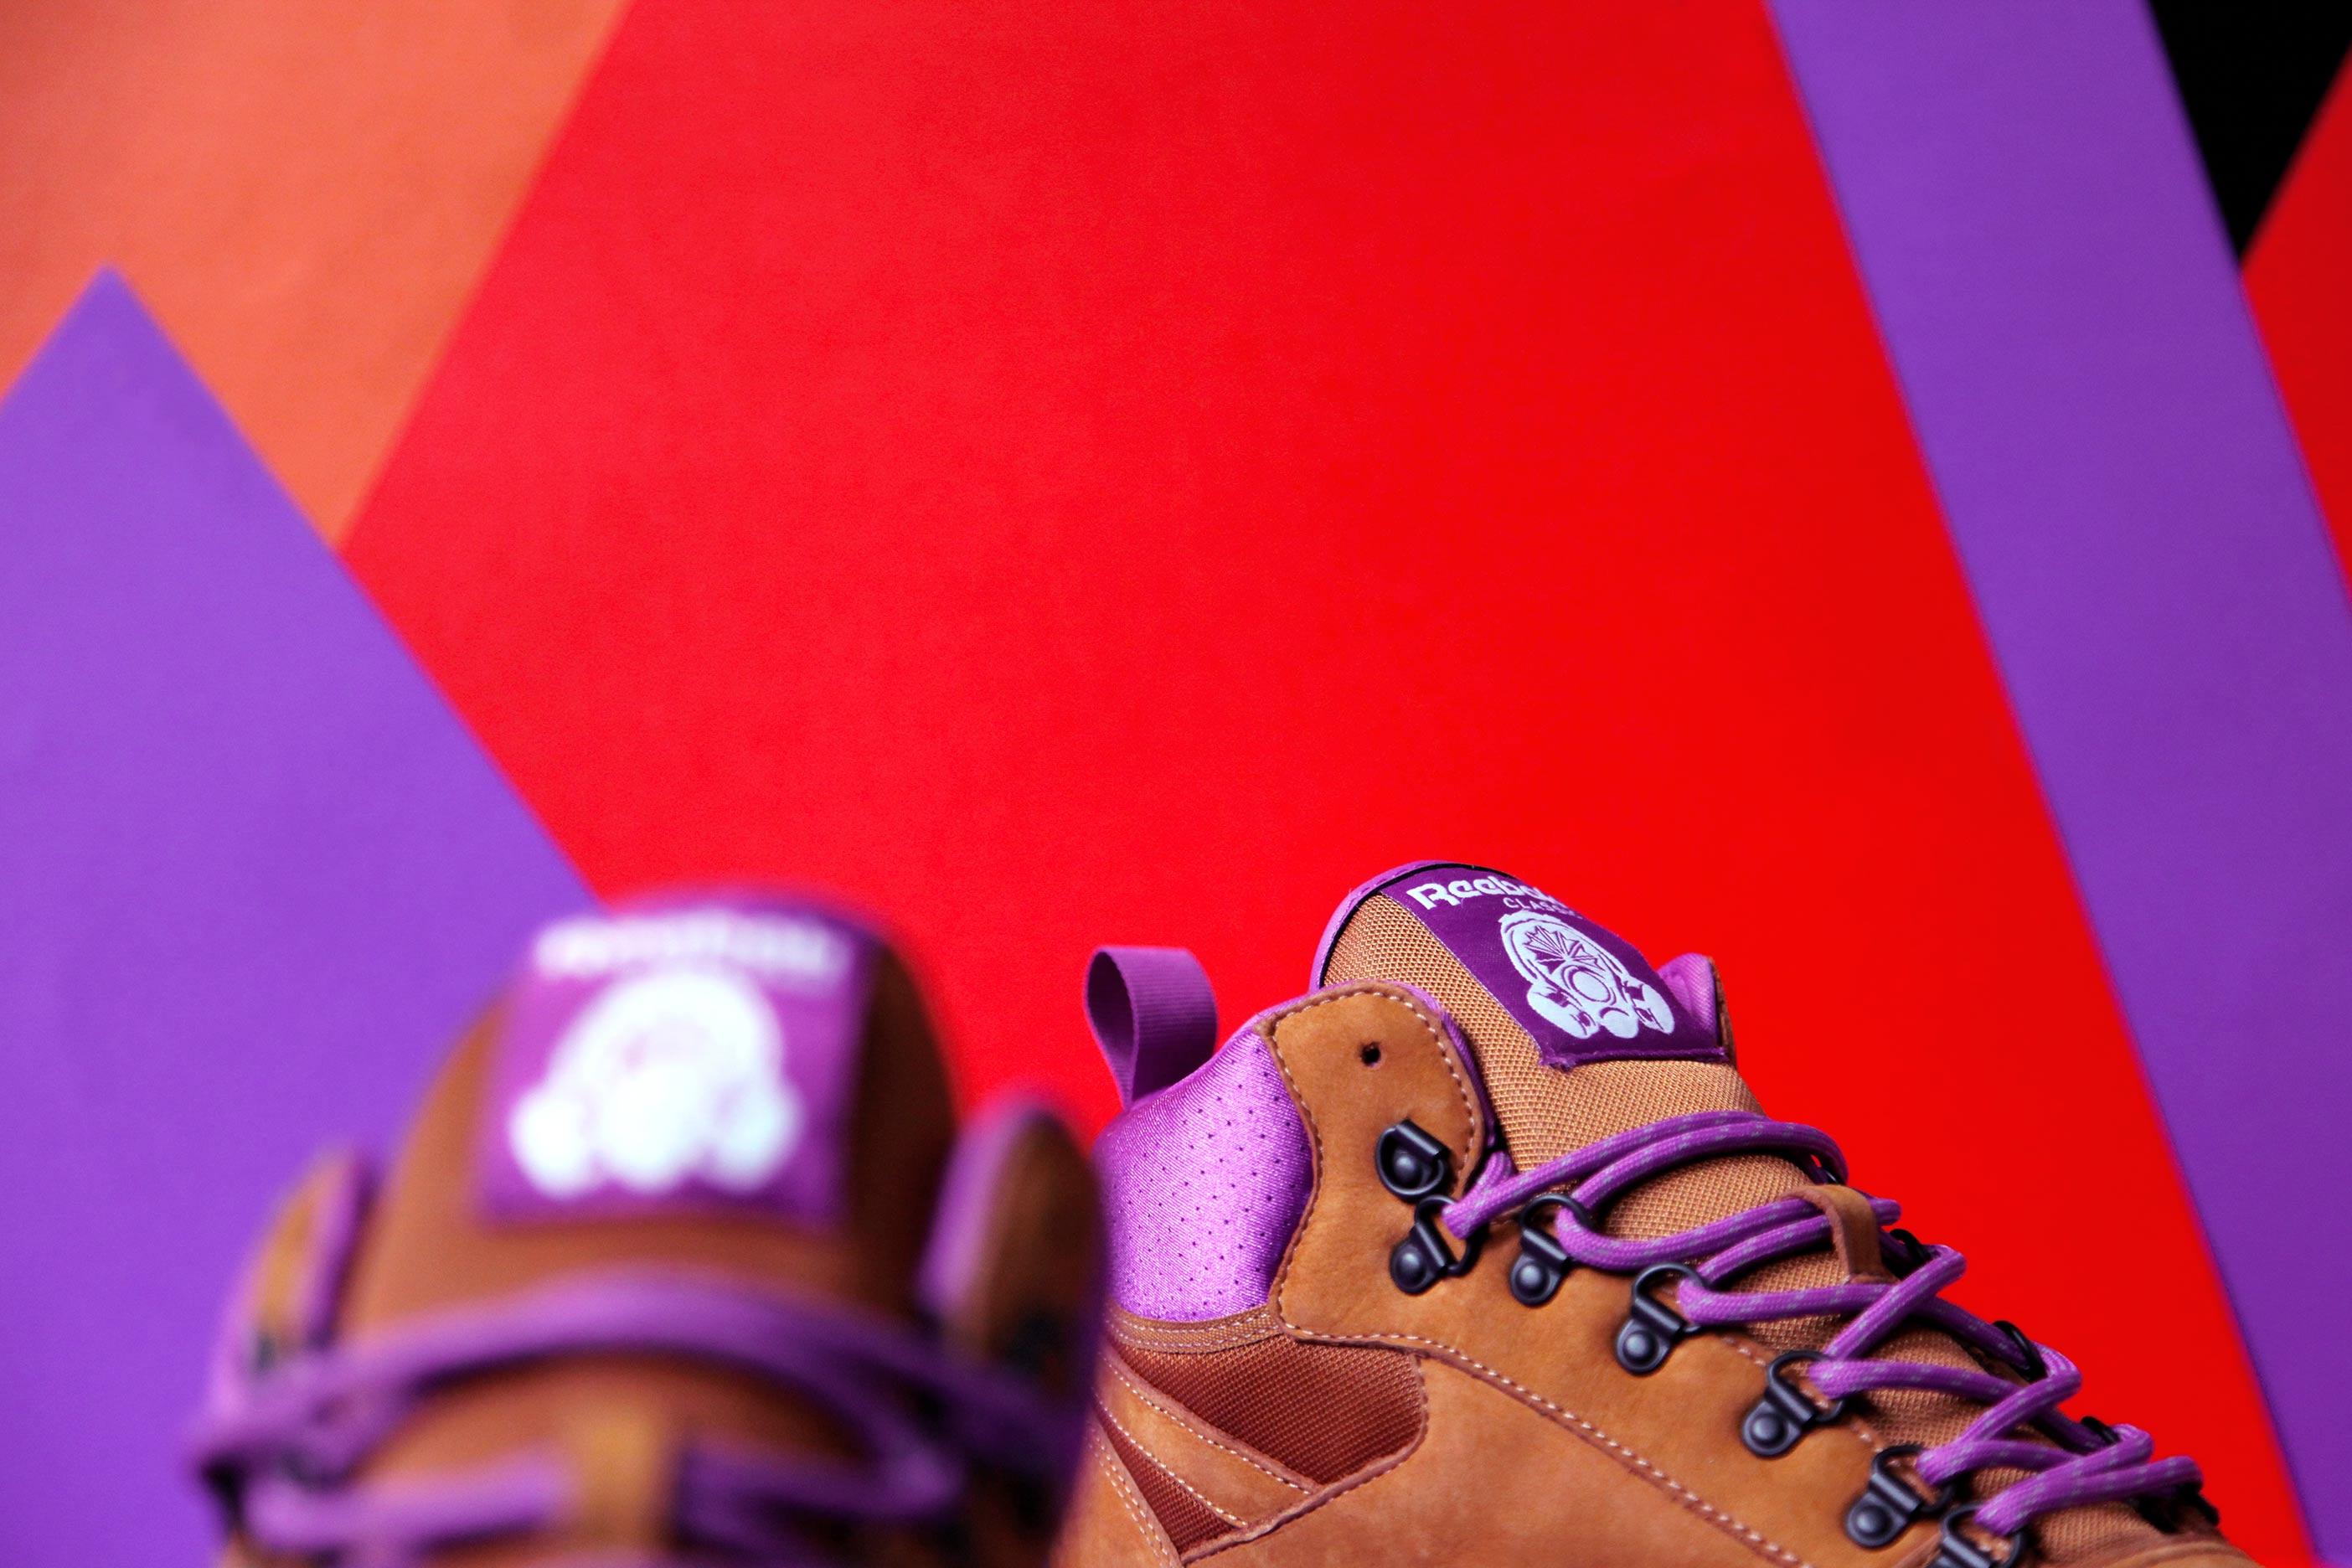 foot-patrol-reebok-classic-leather-mid-on-the-rocks-11